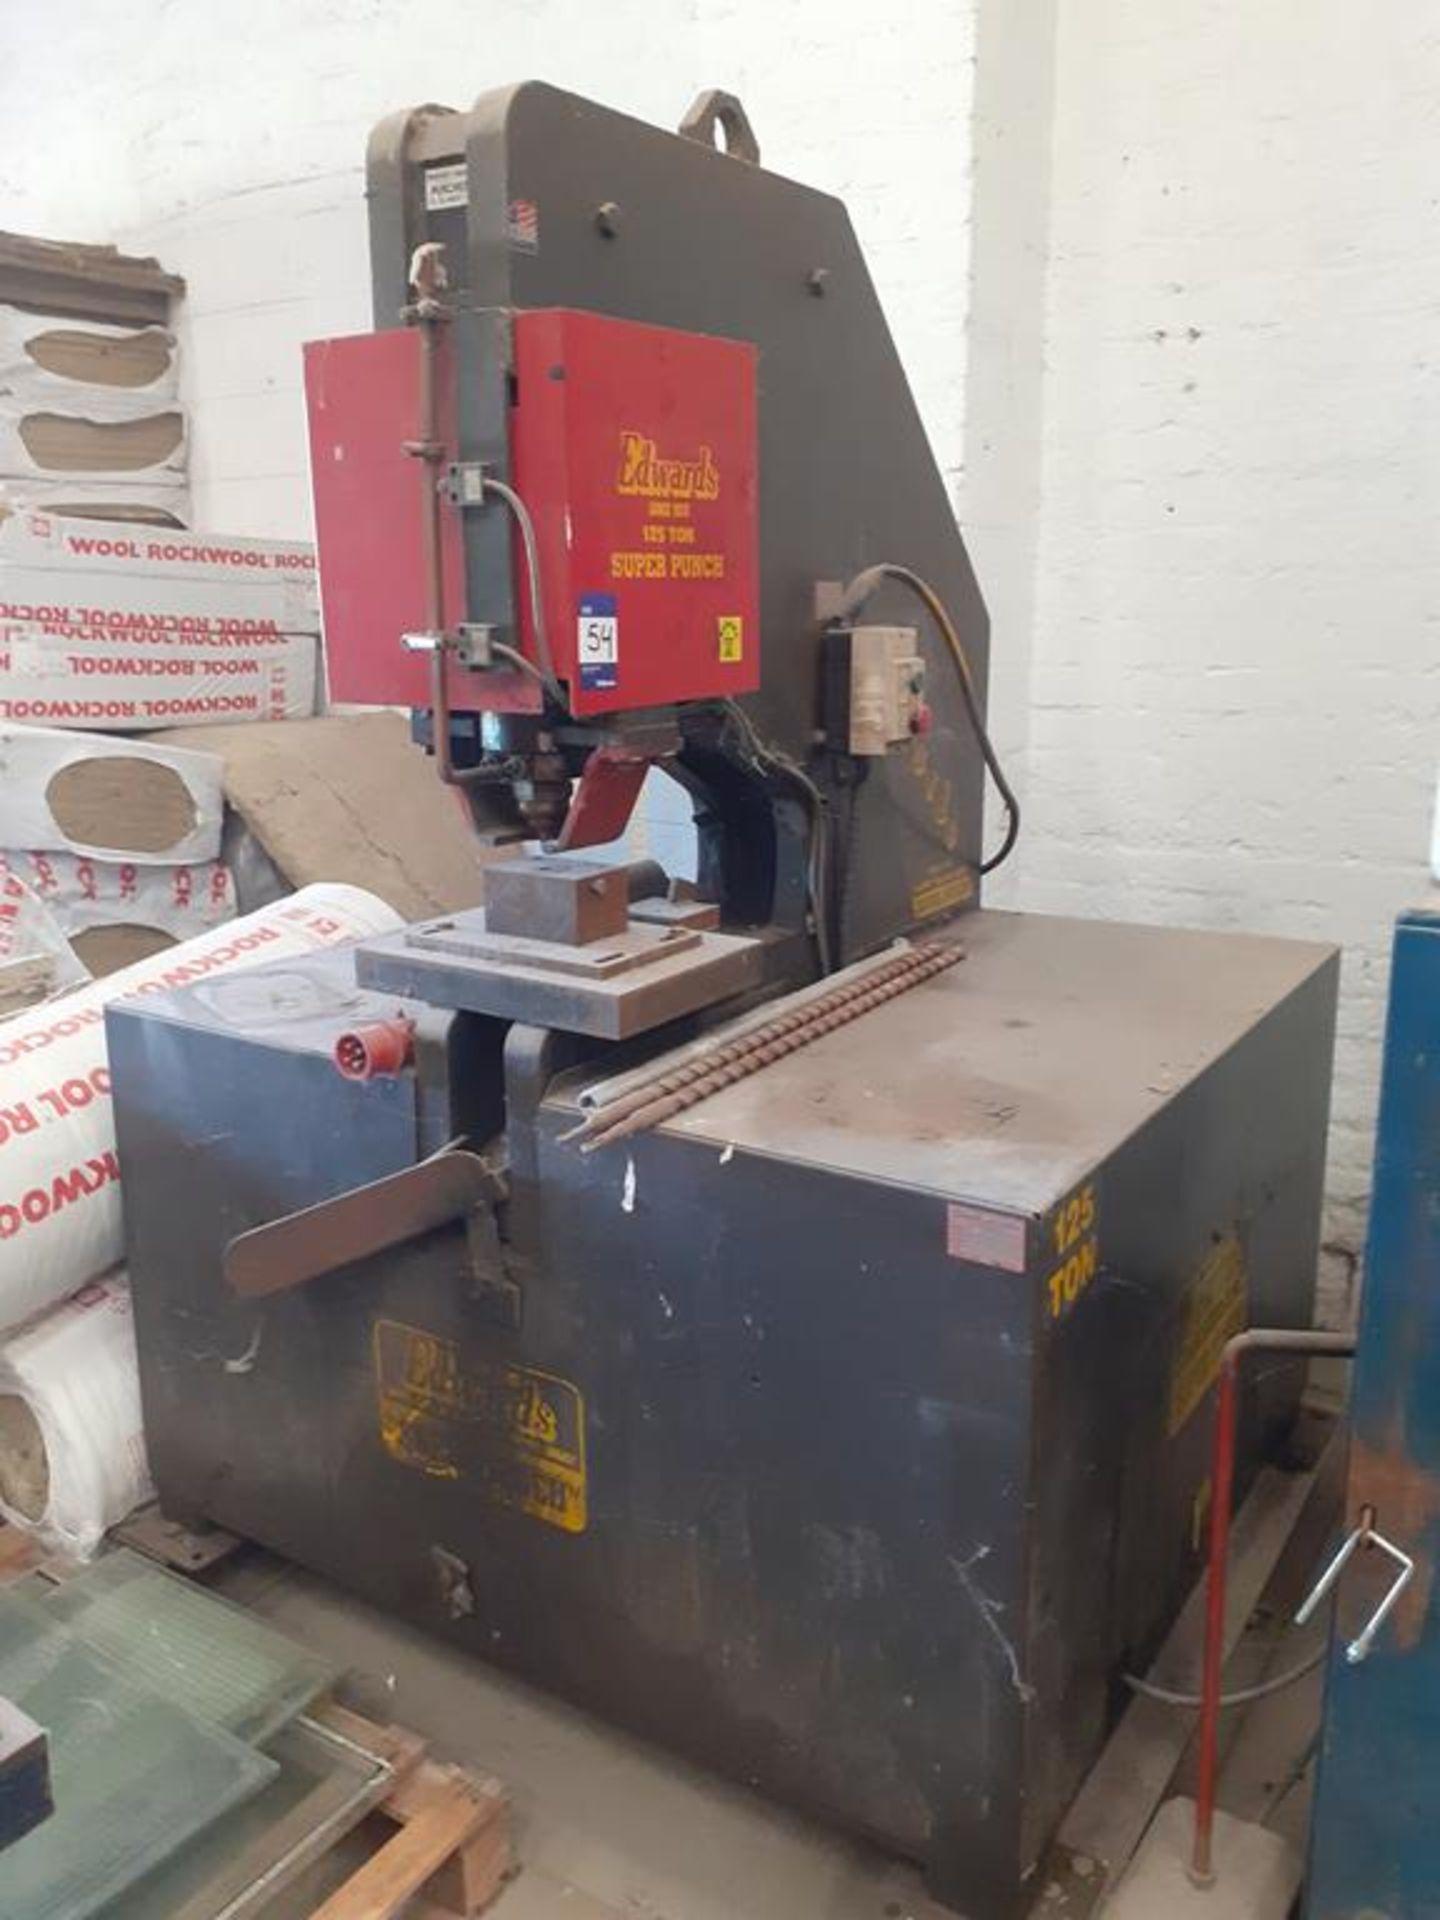 Edwards 125 ton super punch power press